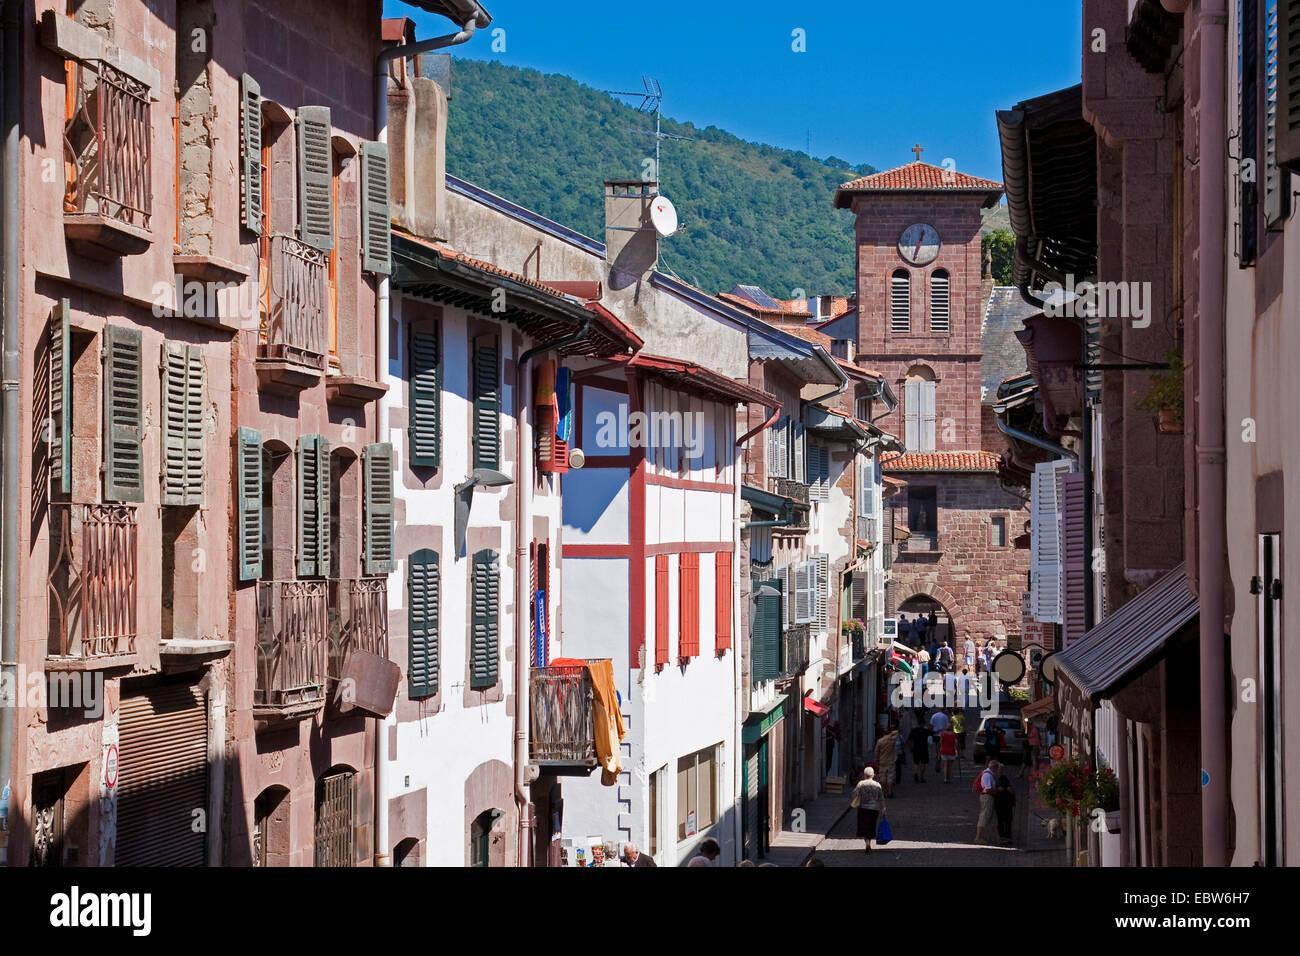 toen gate in Rue d'Espagne, France, Pyr�nn�es-Atlantiques, St.-Jean-Pied-de-Port - Stock Image